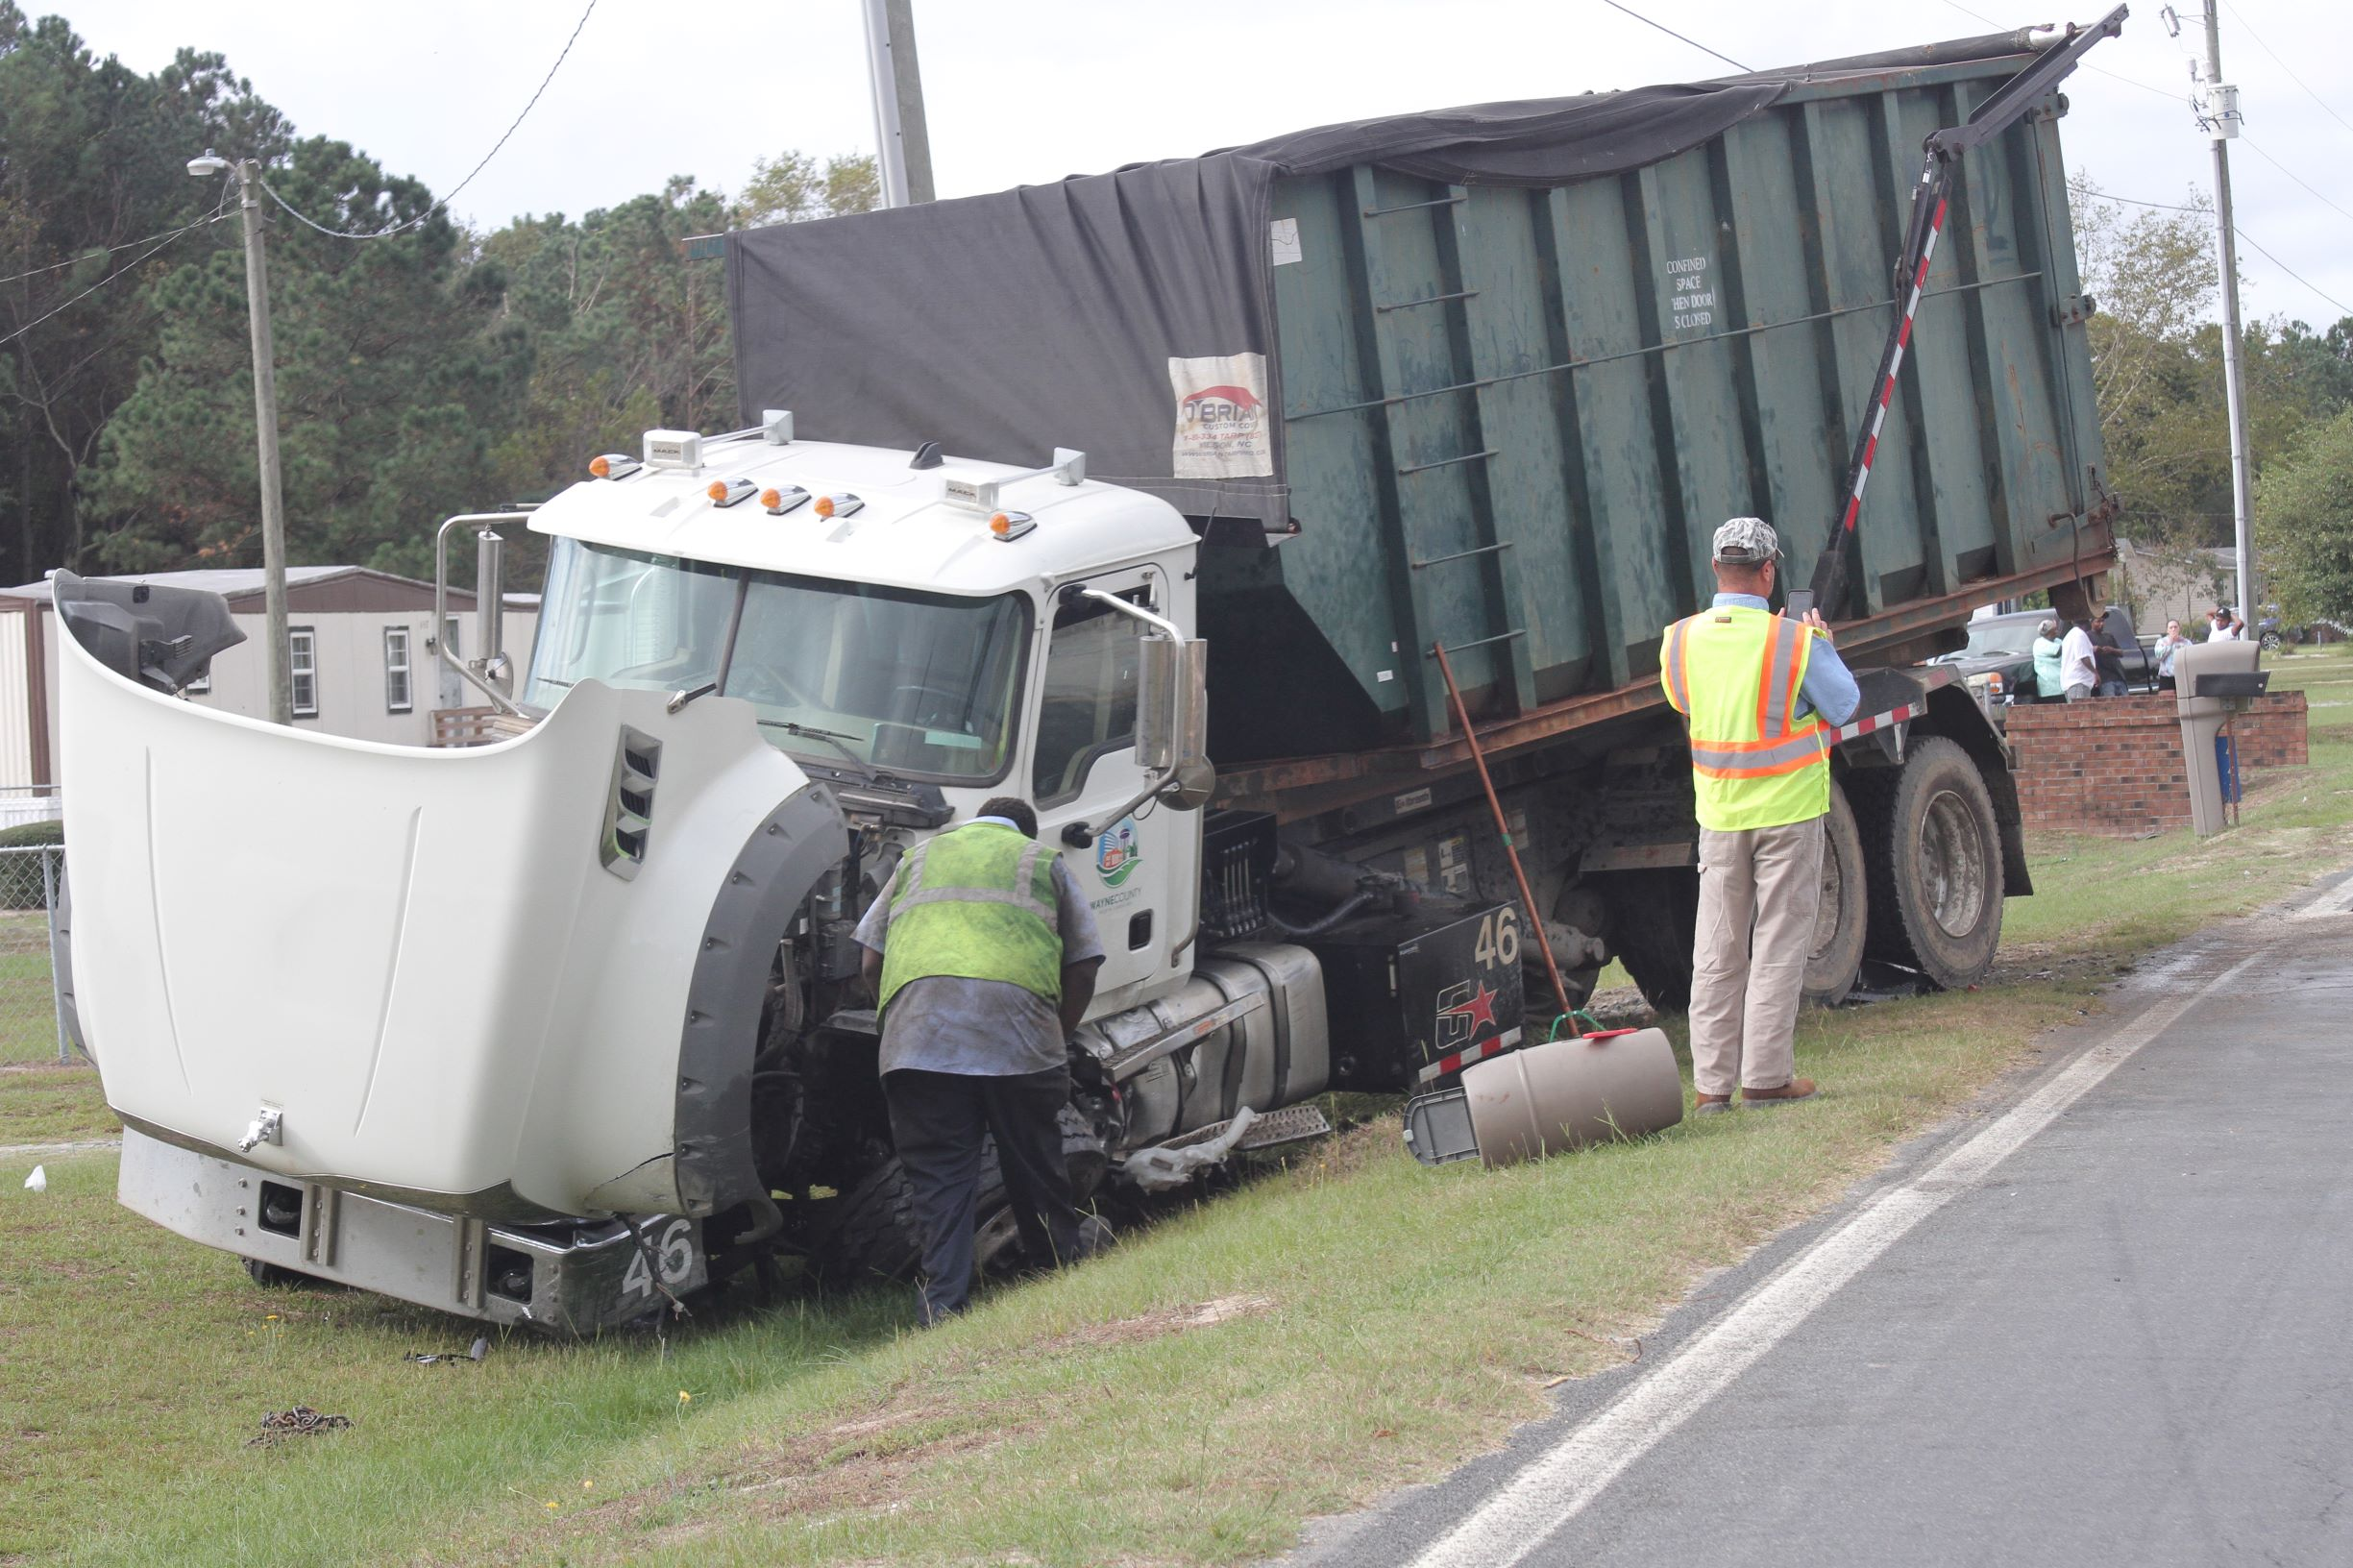 Car, Sanitation Truck Collide On Durham Lake Road (PHOTO GALLERY)